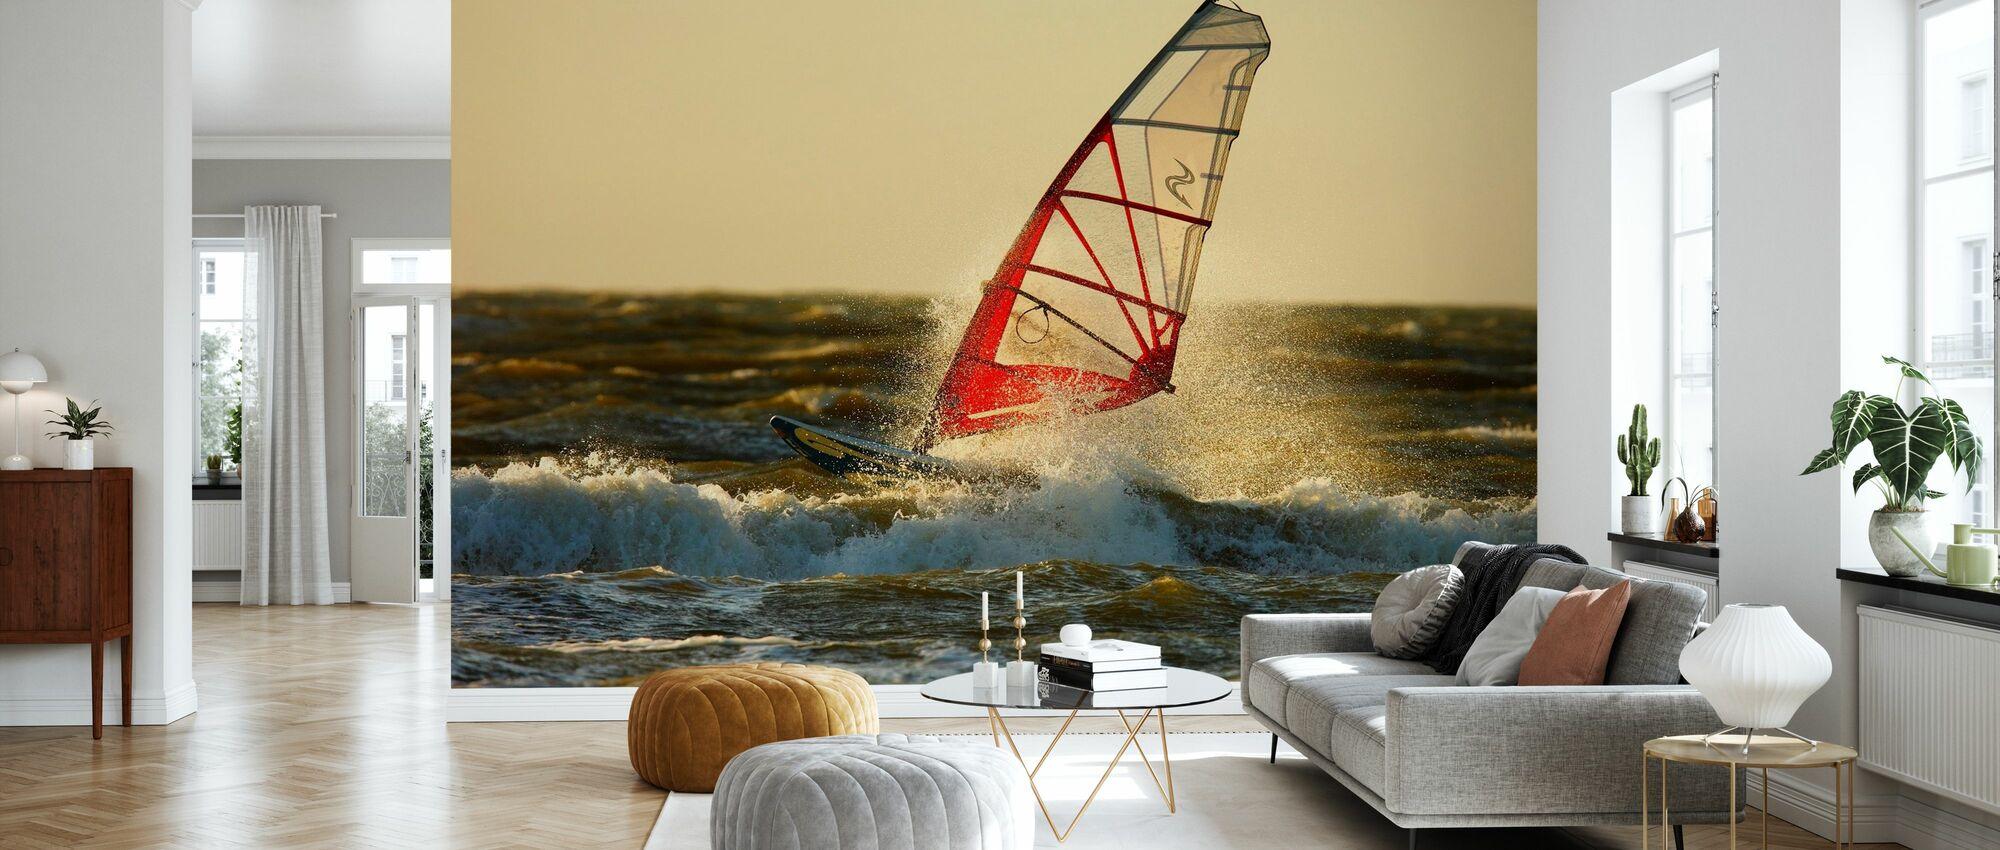 Surfing in Sweden, Europe - Wallpaper - Living Room